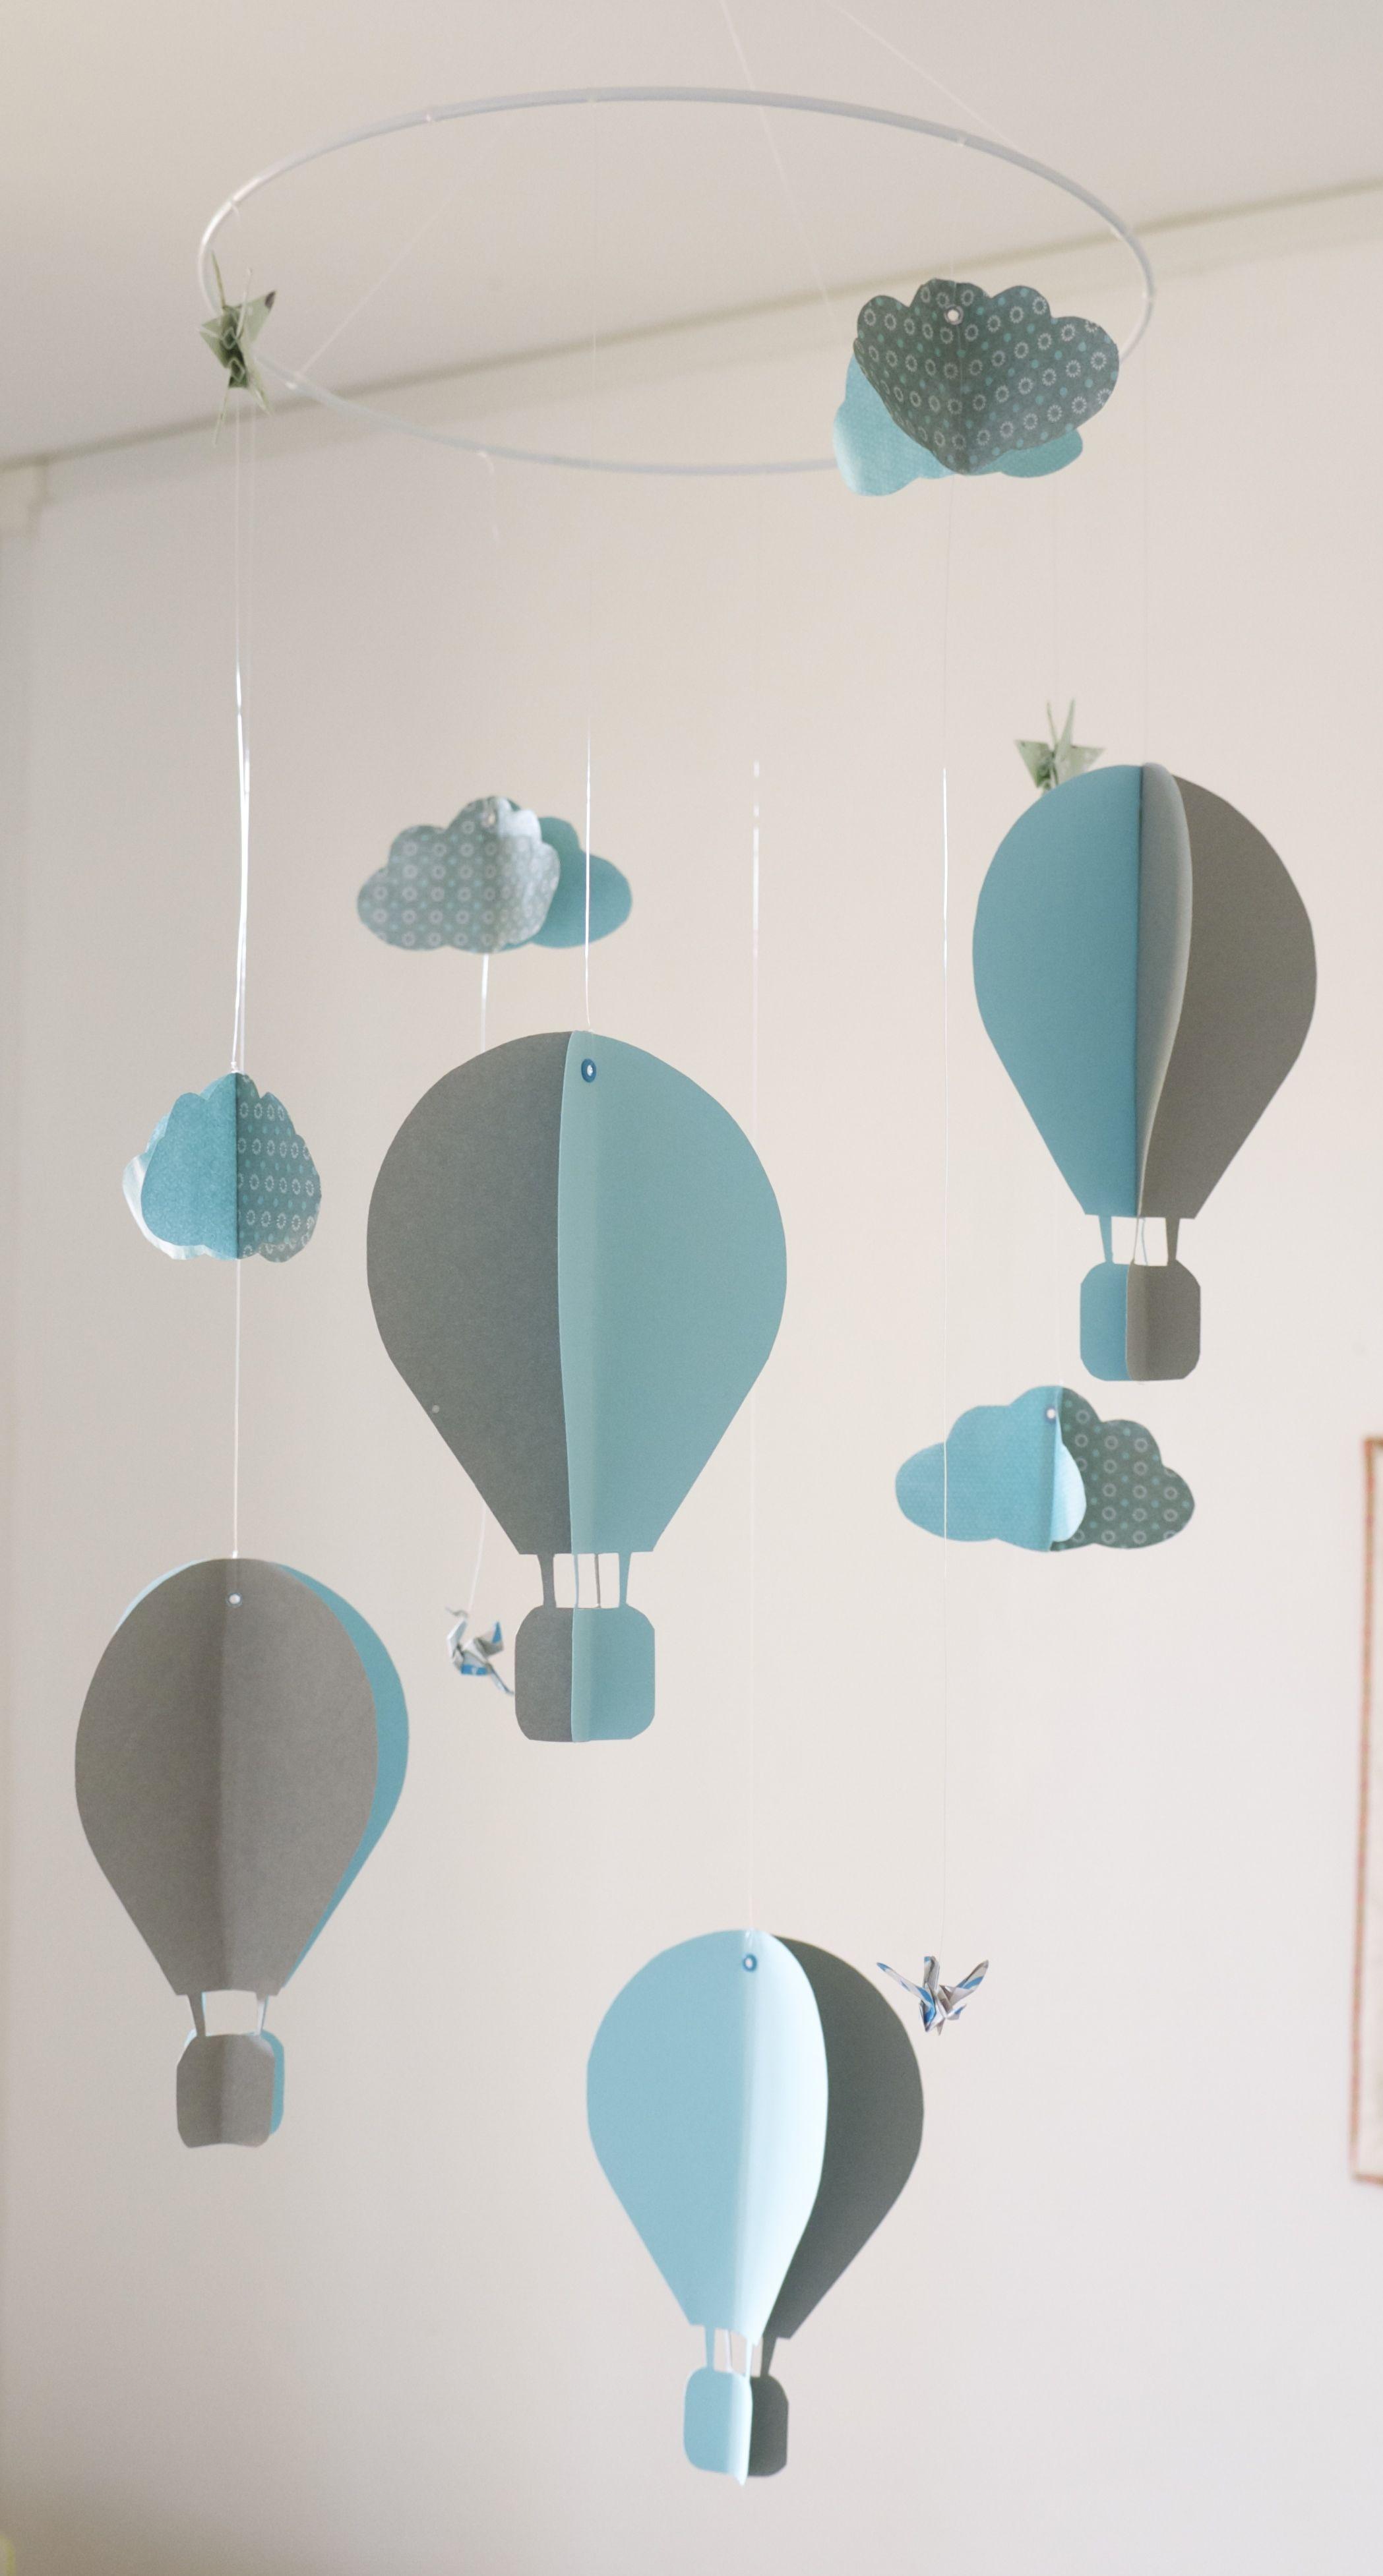 mobile b b origami suspension en spirale chambre enfant b b montgolfi re nuage oiseau cigogne. Black Bedroom Furniture Sets. Home Design Ideas